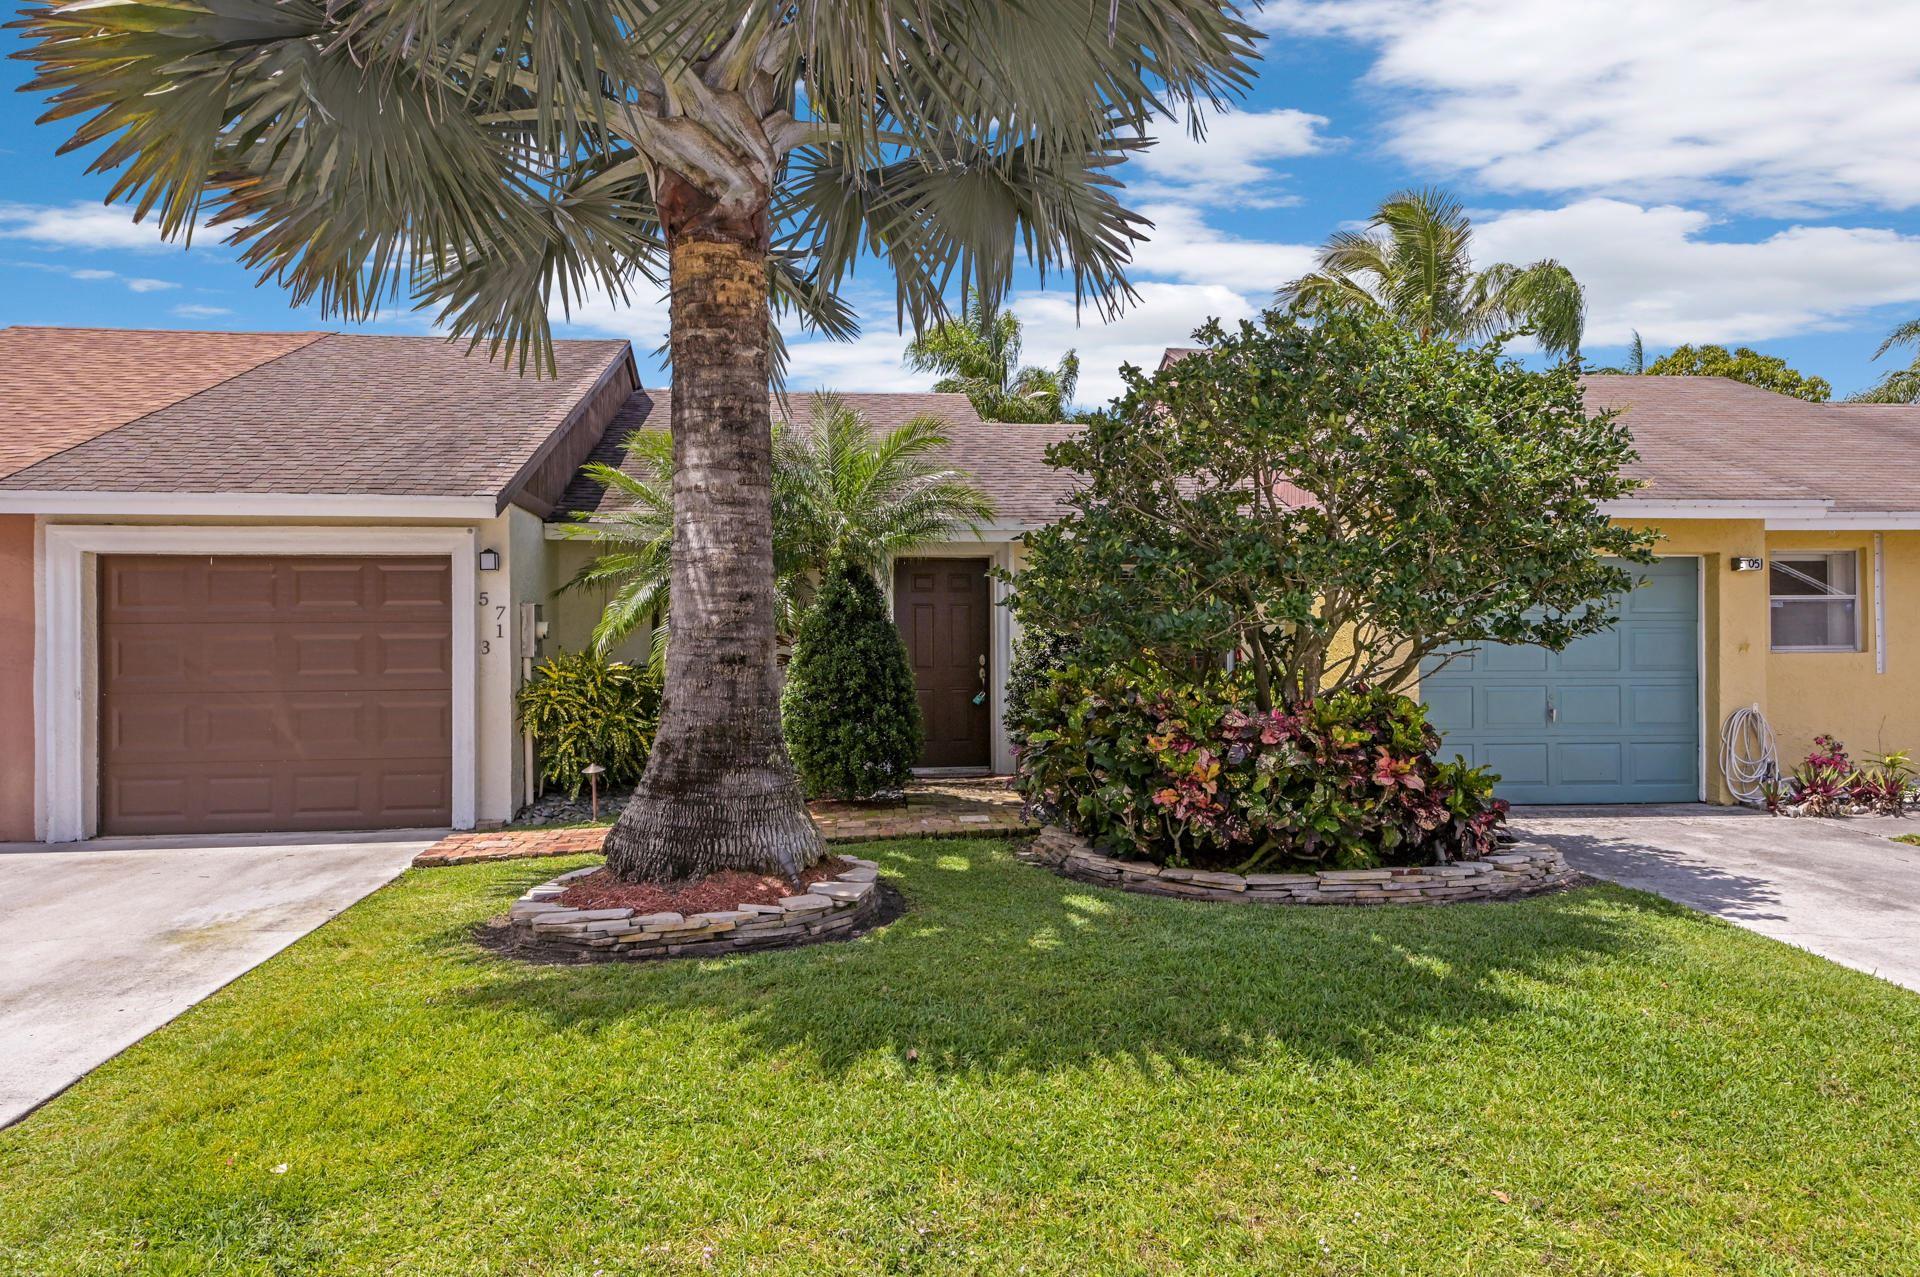 5713 Stonington Way, Lake Worth, FL 33463 - MLS#: RX-10706229